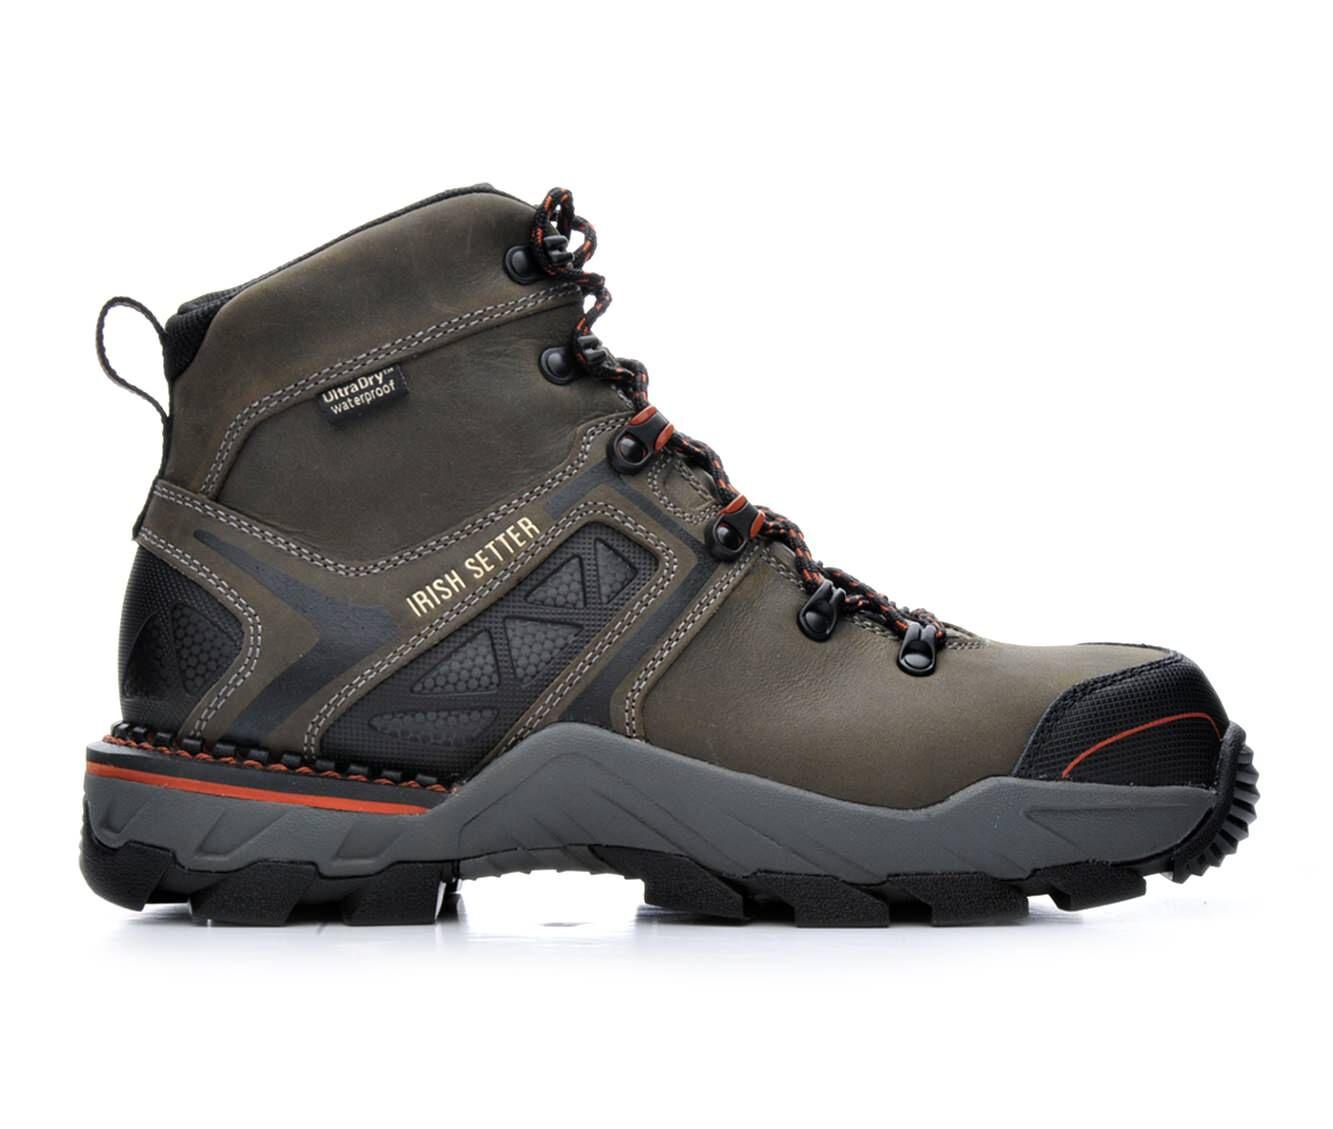 Men\u0027s Red Wing,Irish Setter 83628 Crosby Composite Toe Waterproof Work Boots